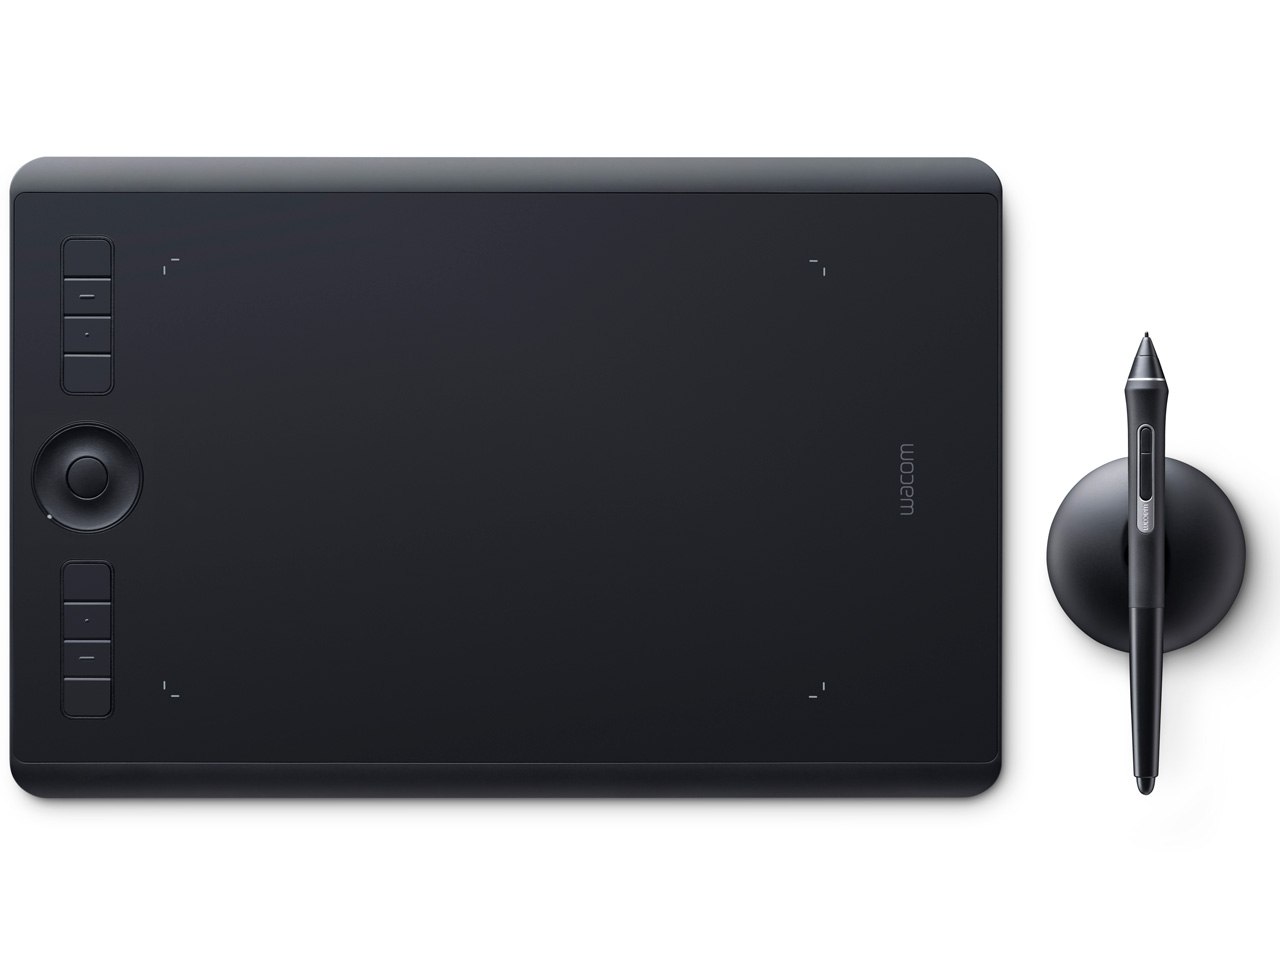 Intuos Pro Medium PTH-660/K0 [ブラック] の製品画像